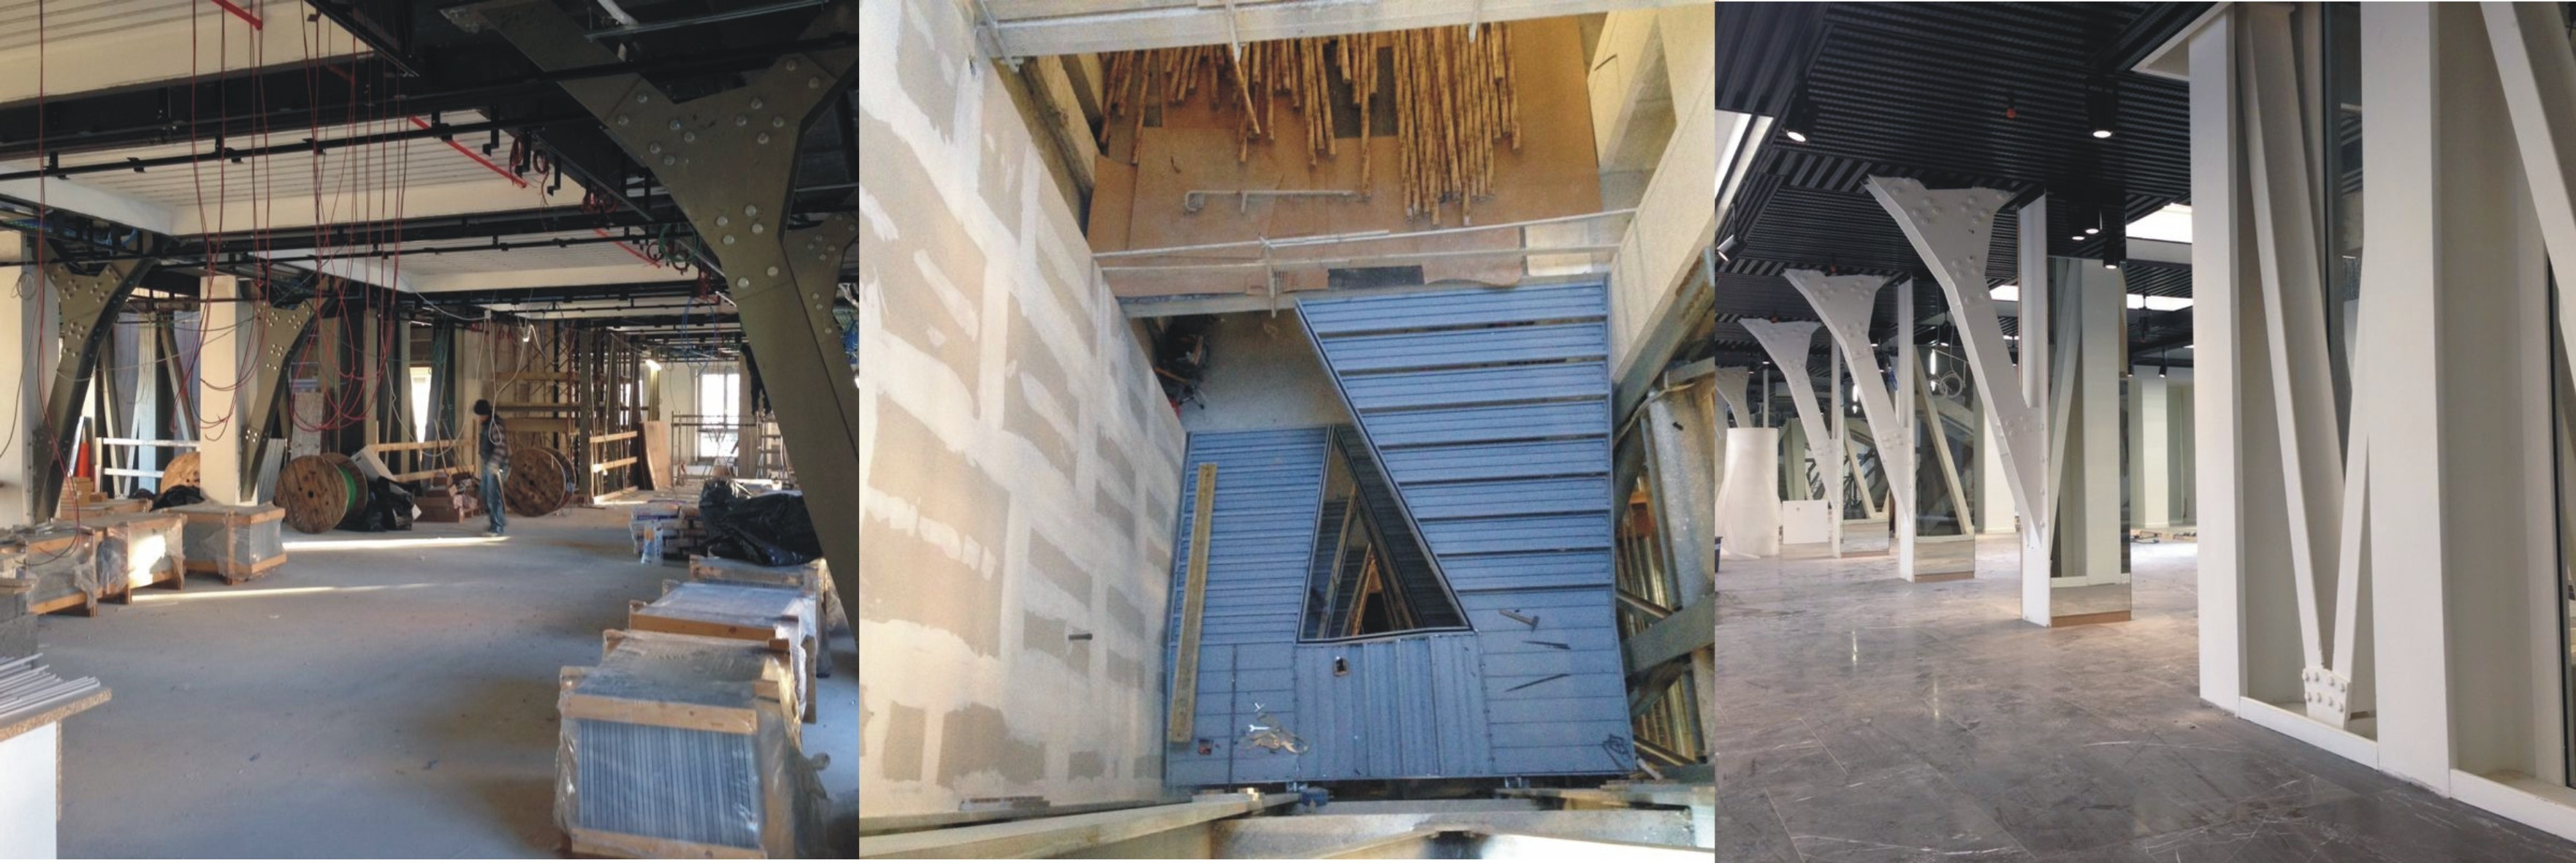 The Brian Architetti BuildingC amp;barry amp;p eCrBQxoWd